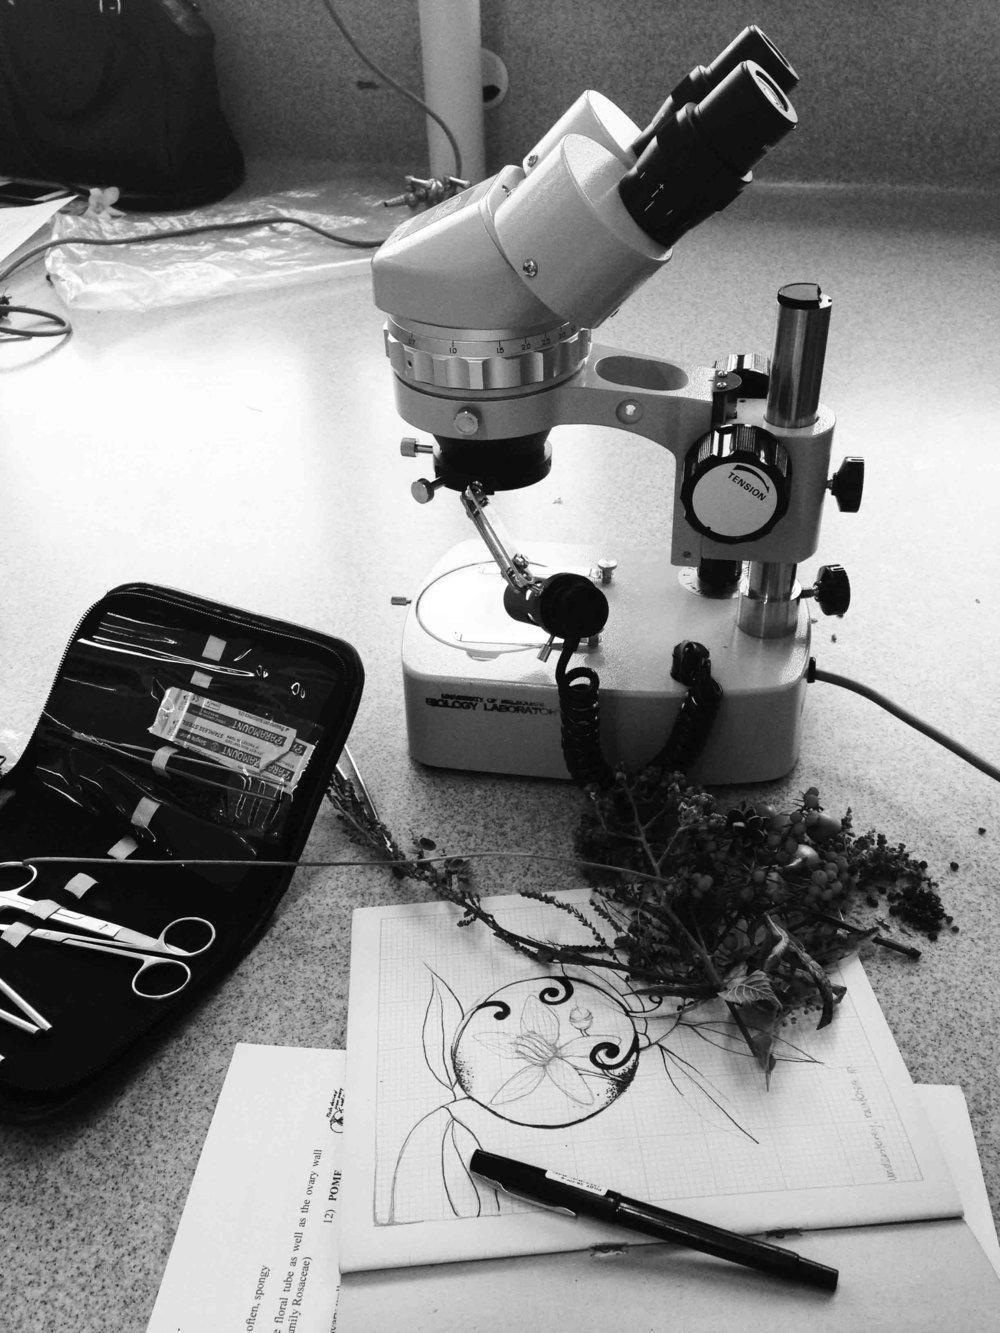 microscope artscience.jpg